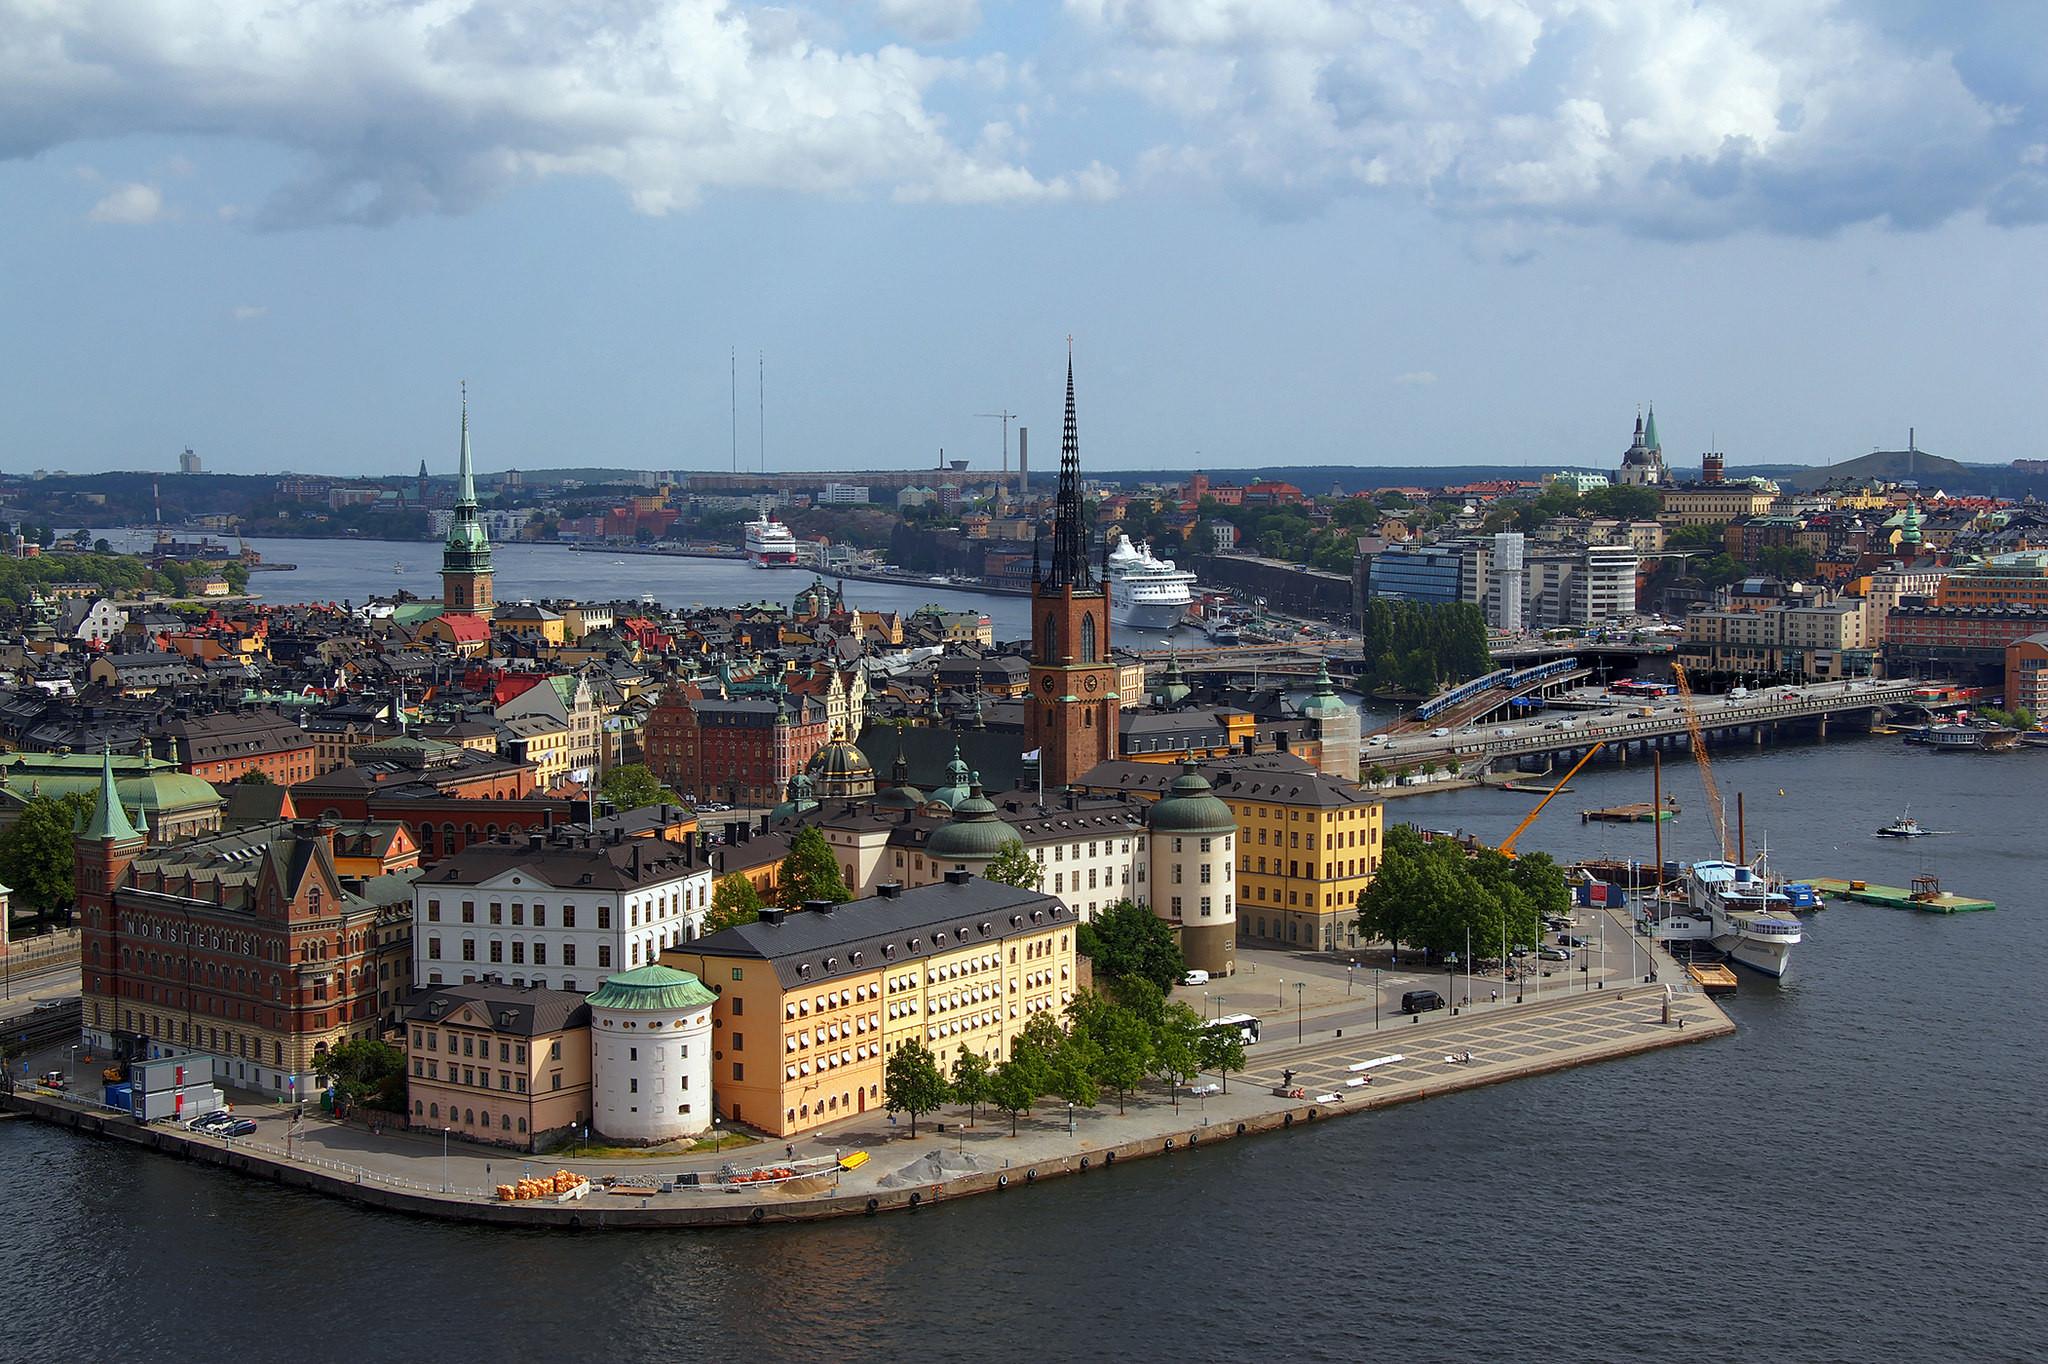 обои Stockholm, Sweden, Riddarholmen, Gamla stan картинки фото